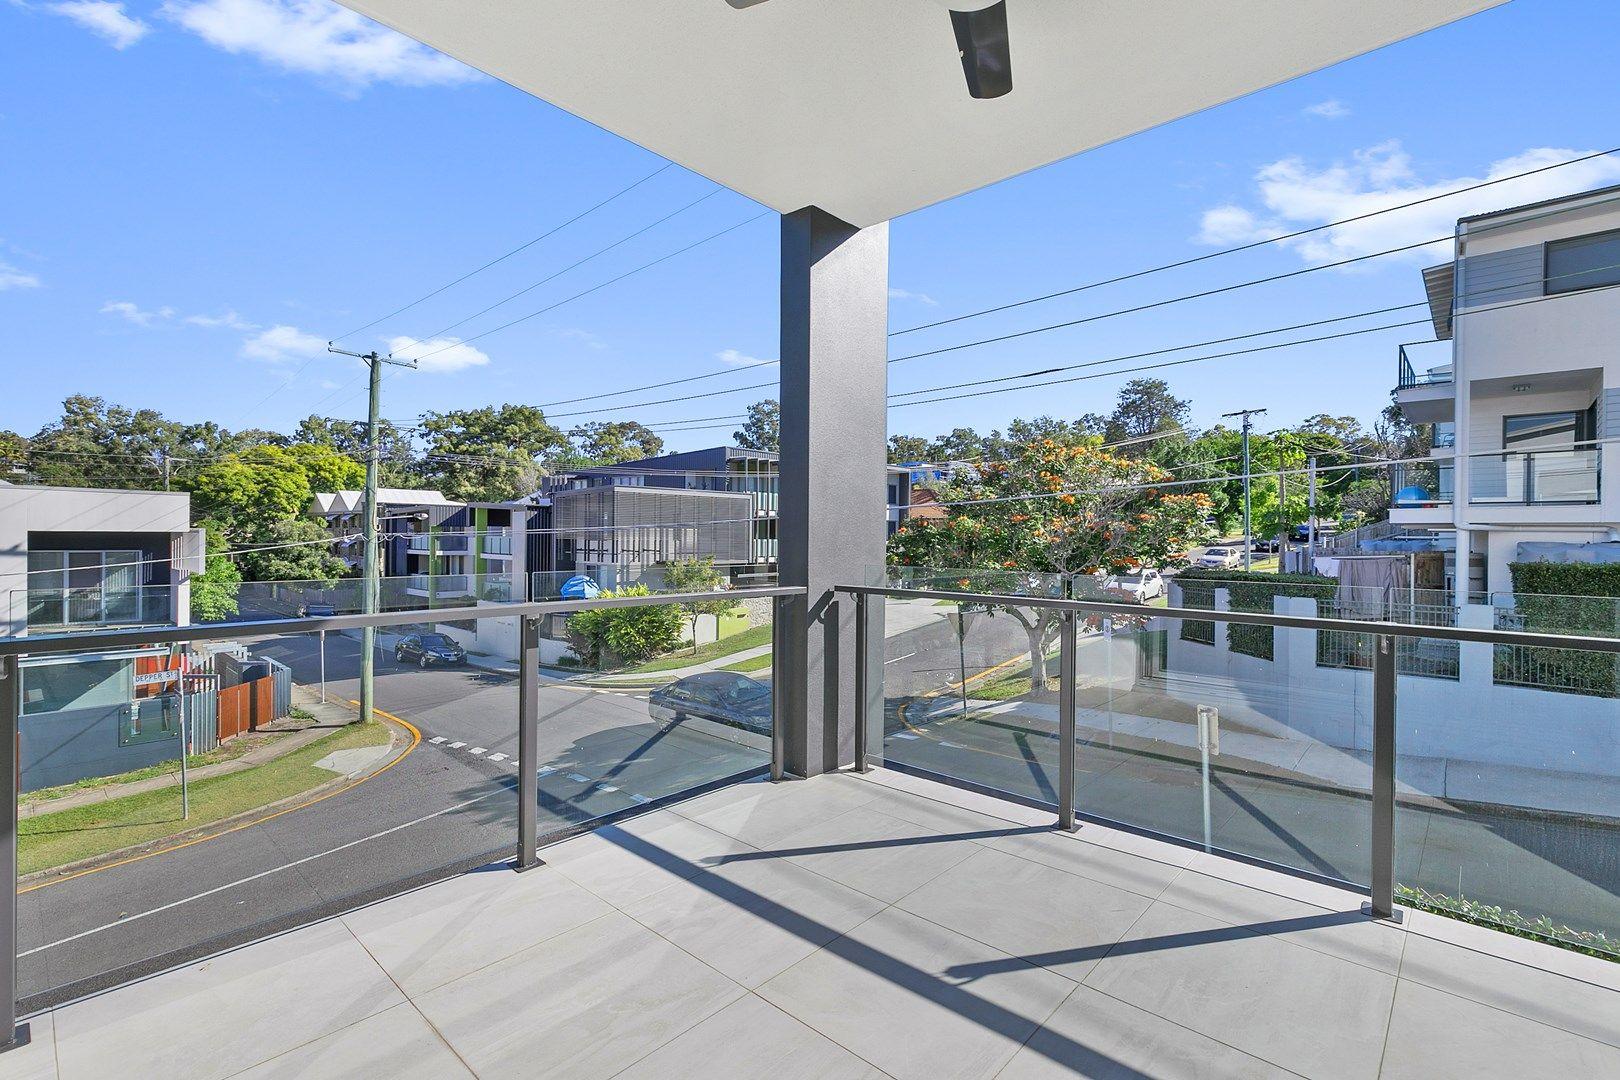 3/50 Depper Street, St Lucia QLD 4067, Image 0